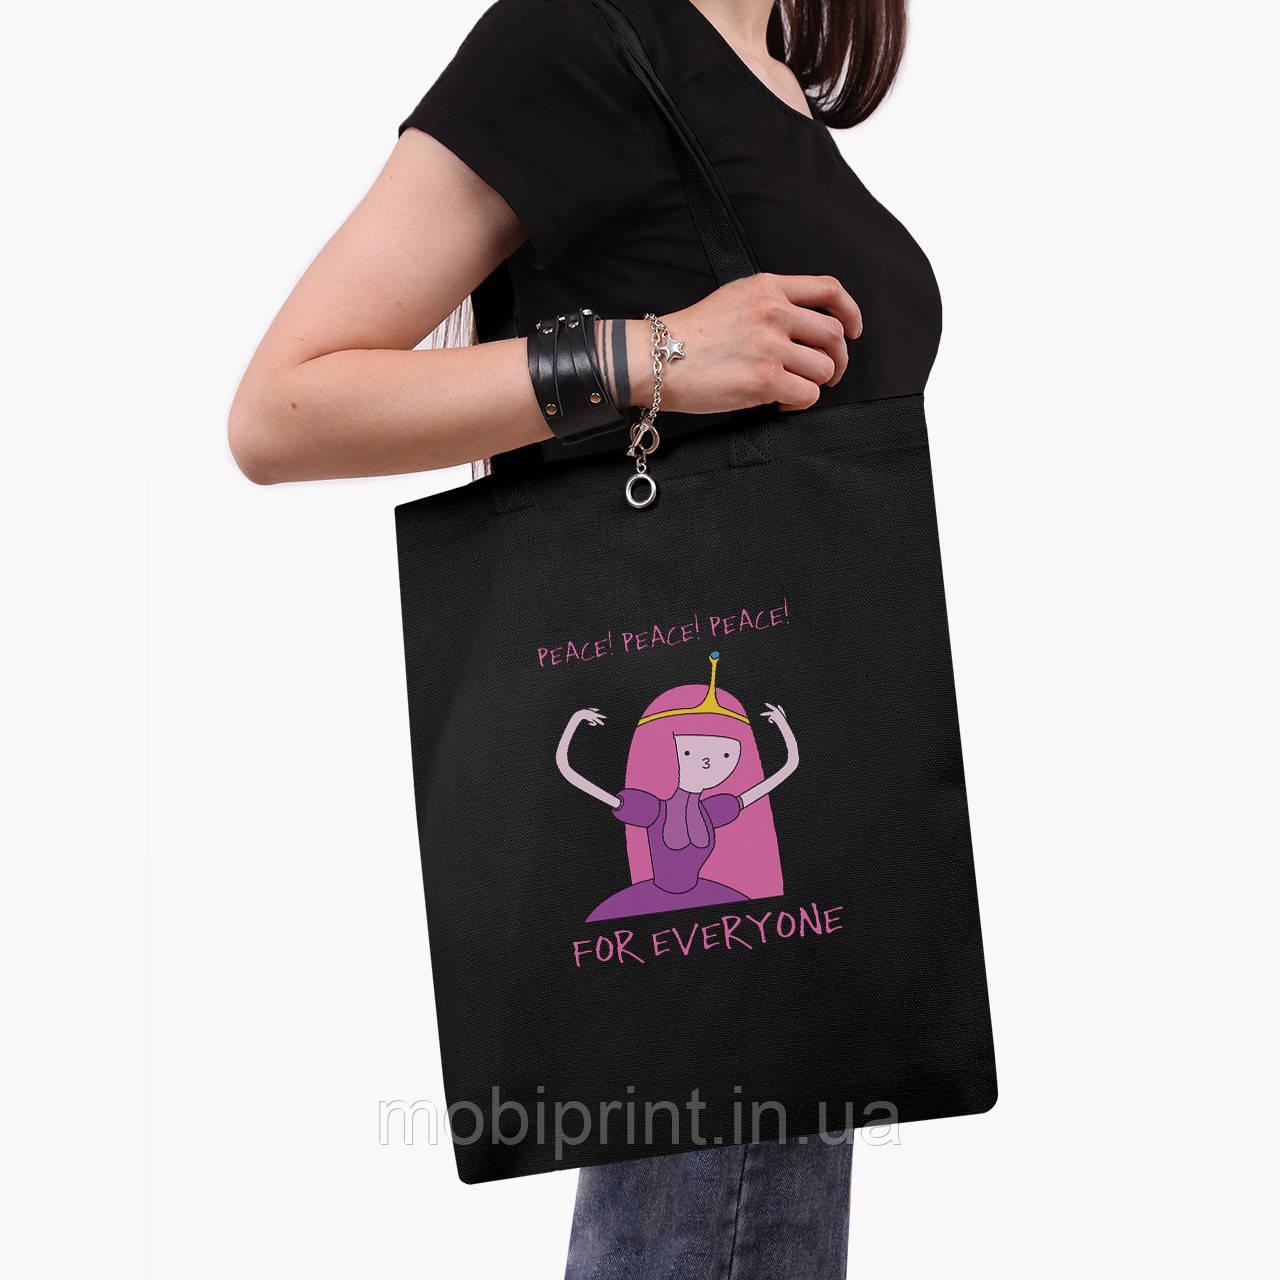 Эко сумка шоппер черная Принцесса бубльгум (Adventure Time) (9227-1576-2)  экосумка шопер 41*35 см